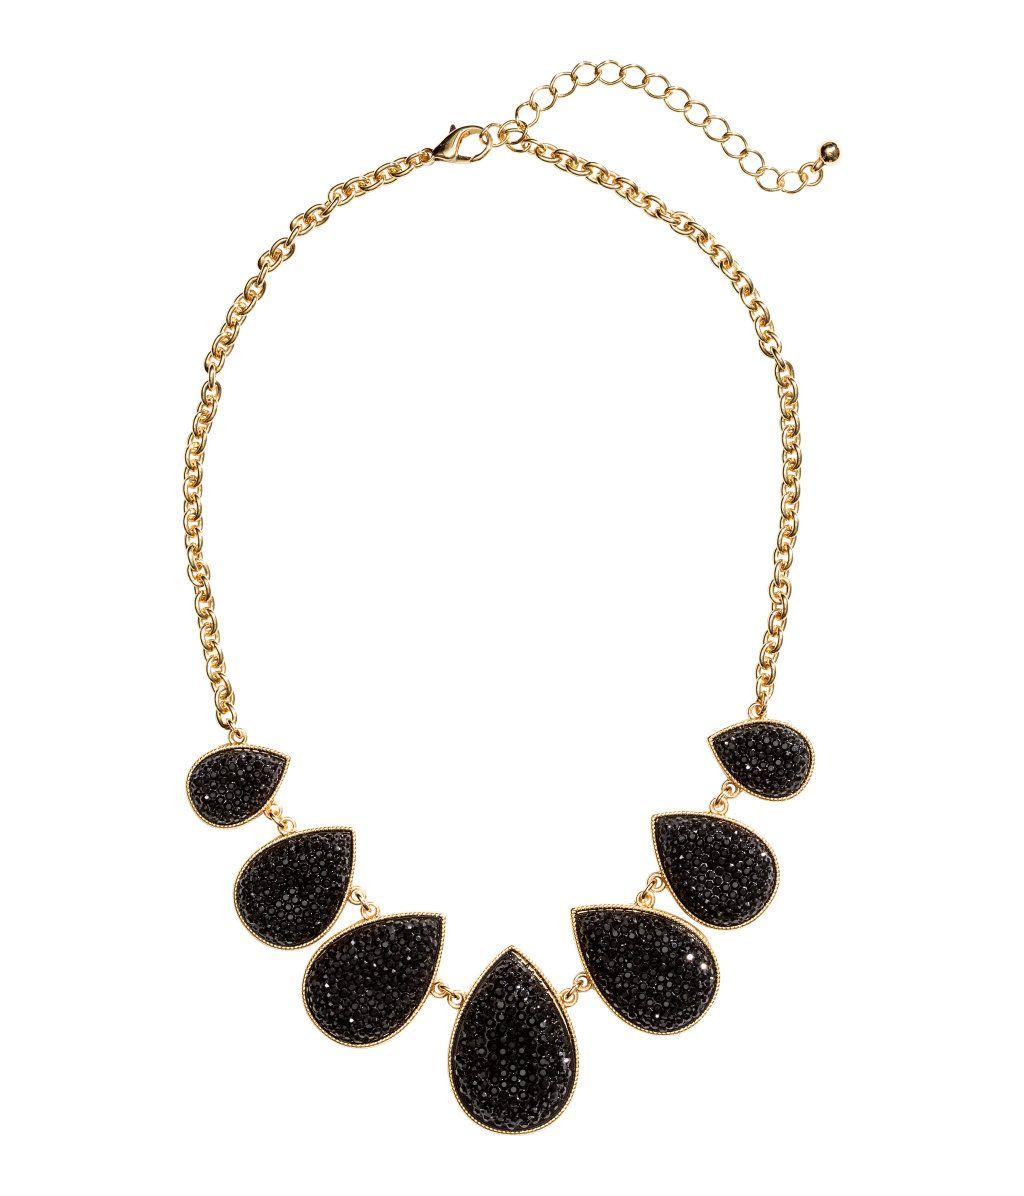 Kort halsband | Product Detail | H&M